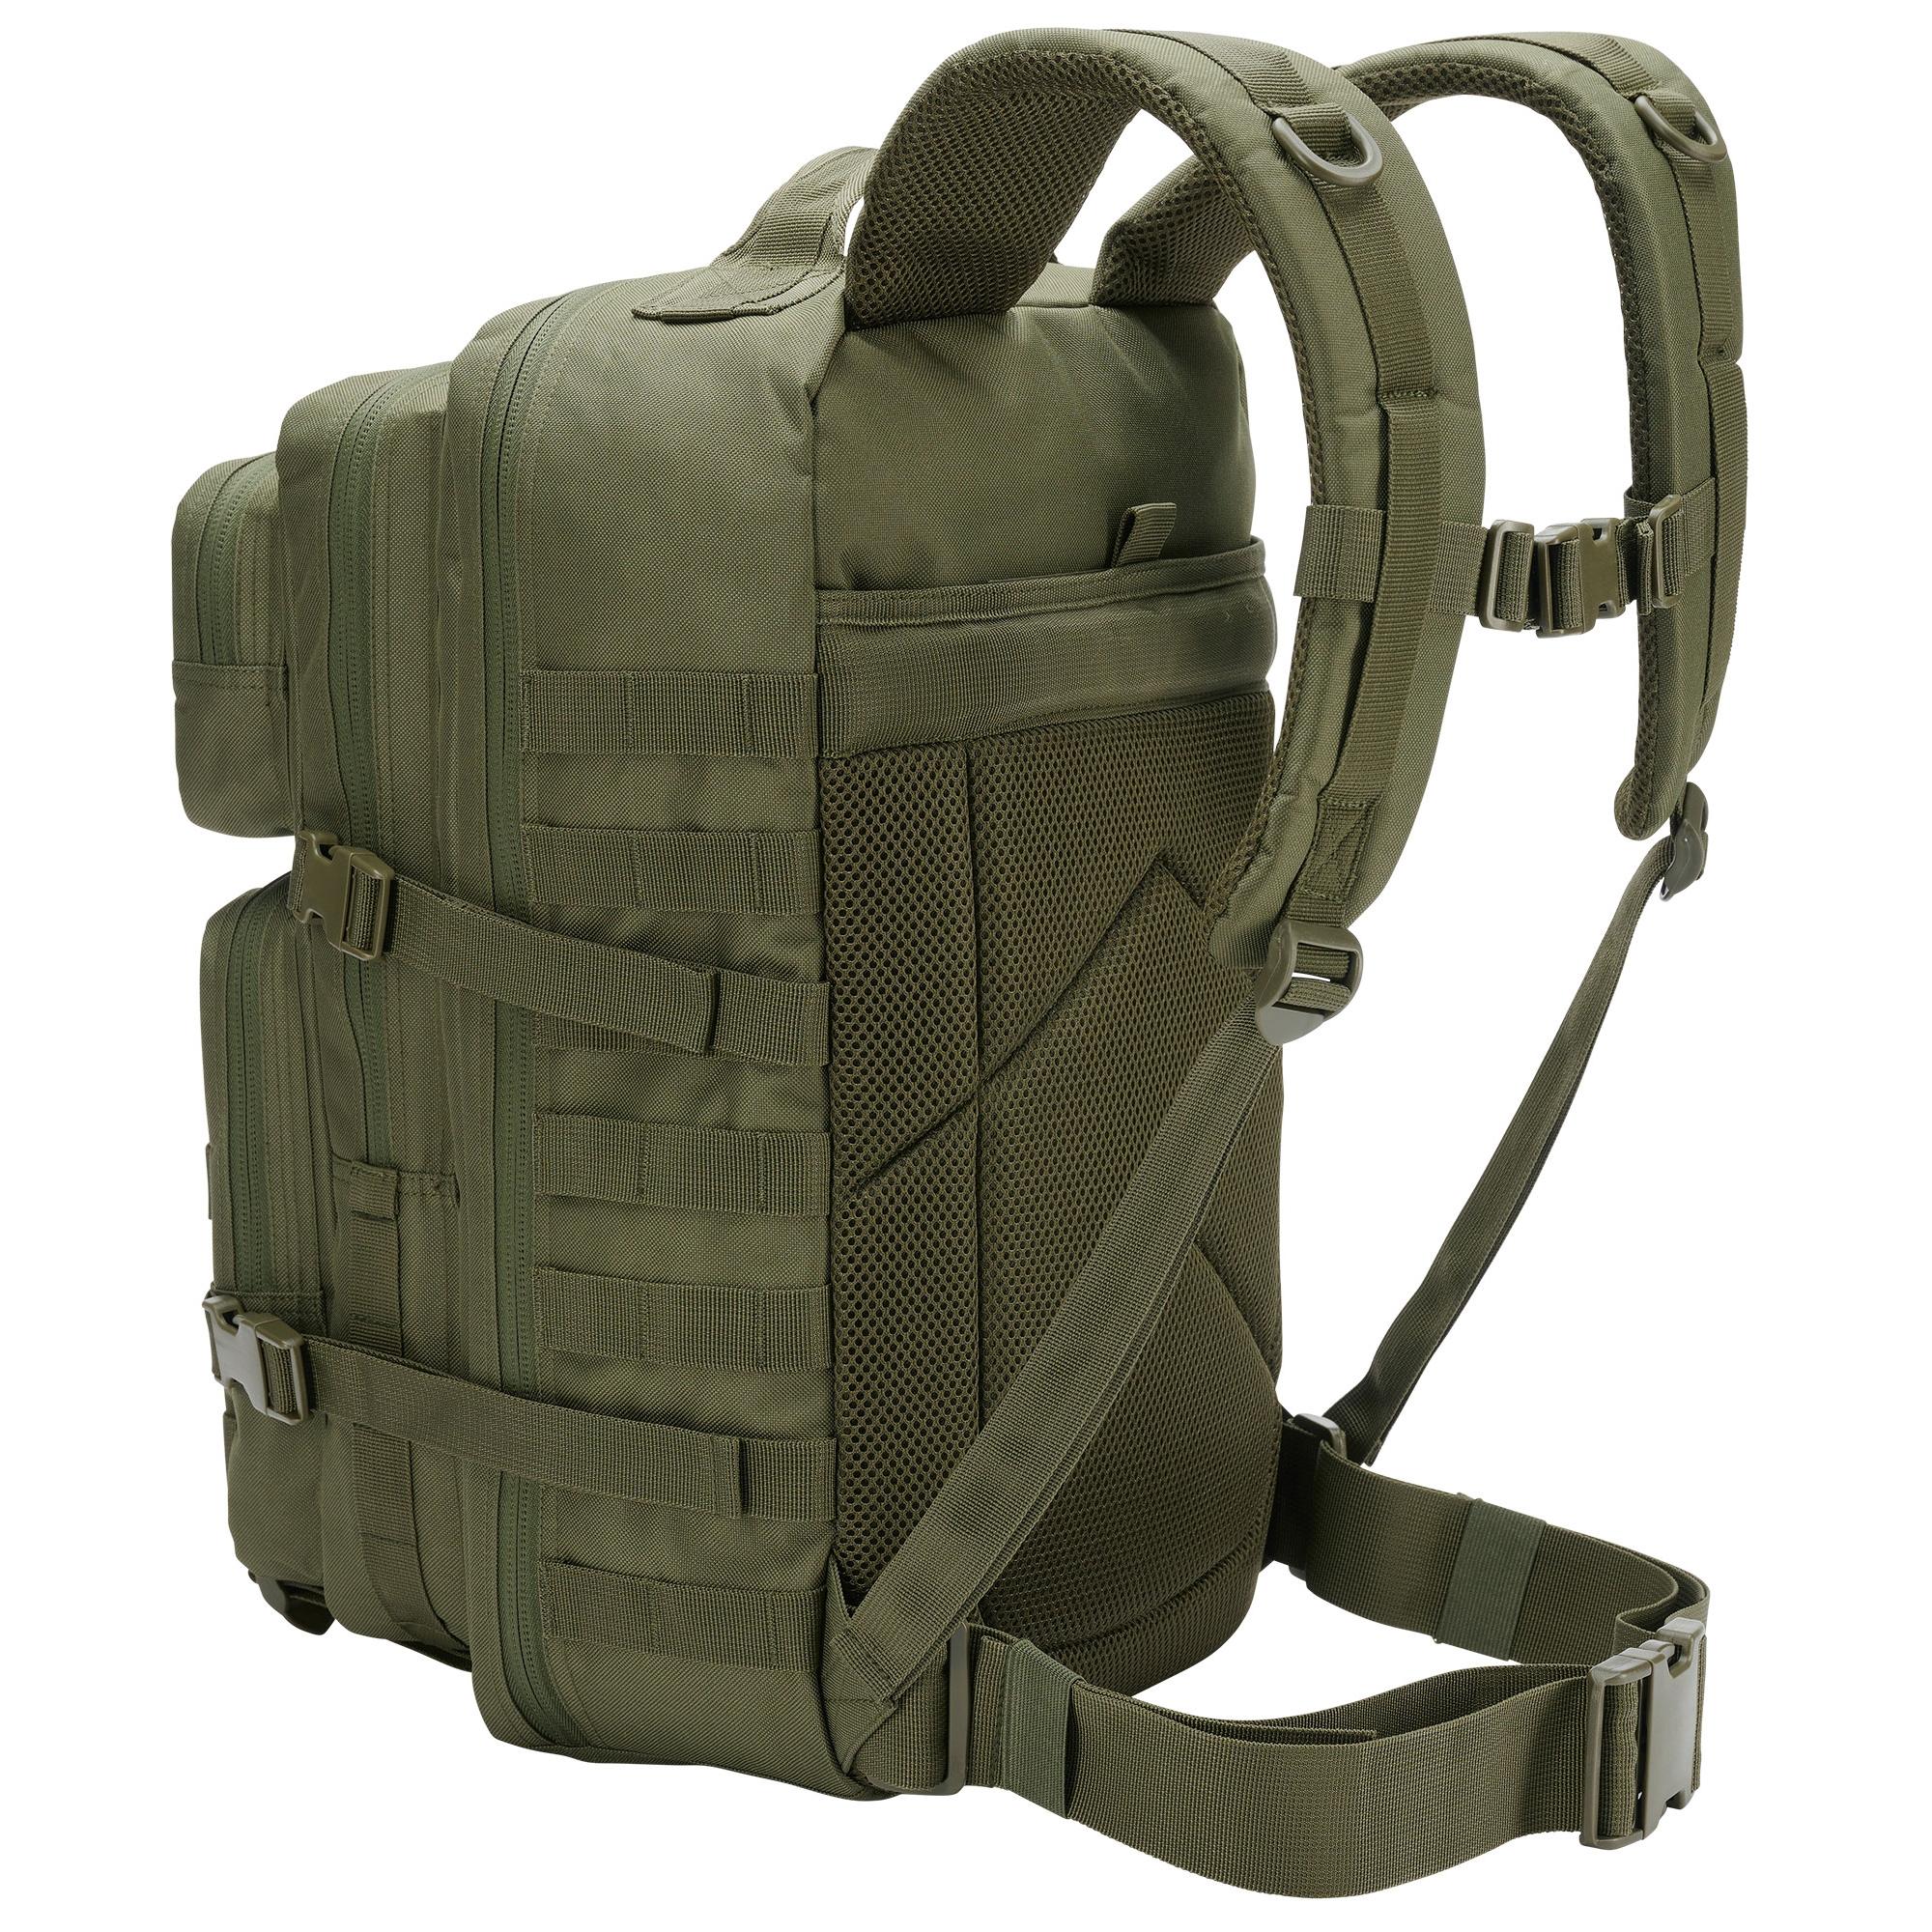 Indexbild 5 - Brandit US Cooper Rucksack Molle Backpack Bundeswehr Armee Wandern Reise Tactica